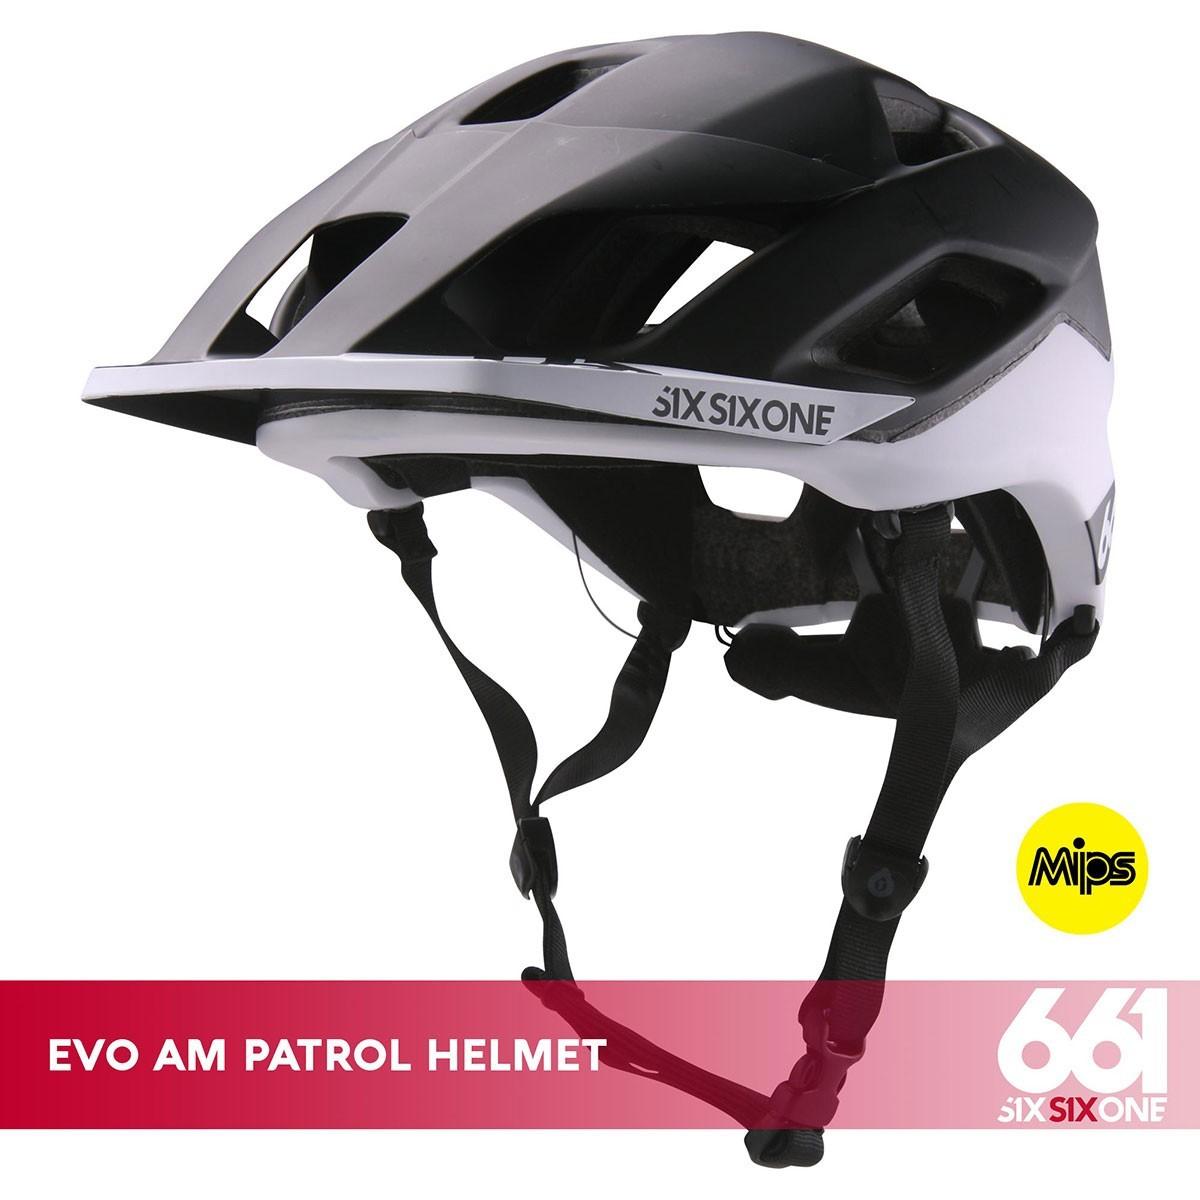 661 EVO AM PATROL MIPS CE BLACK/WHITE - Изображение - AQUAMATRIX